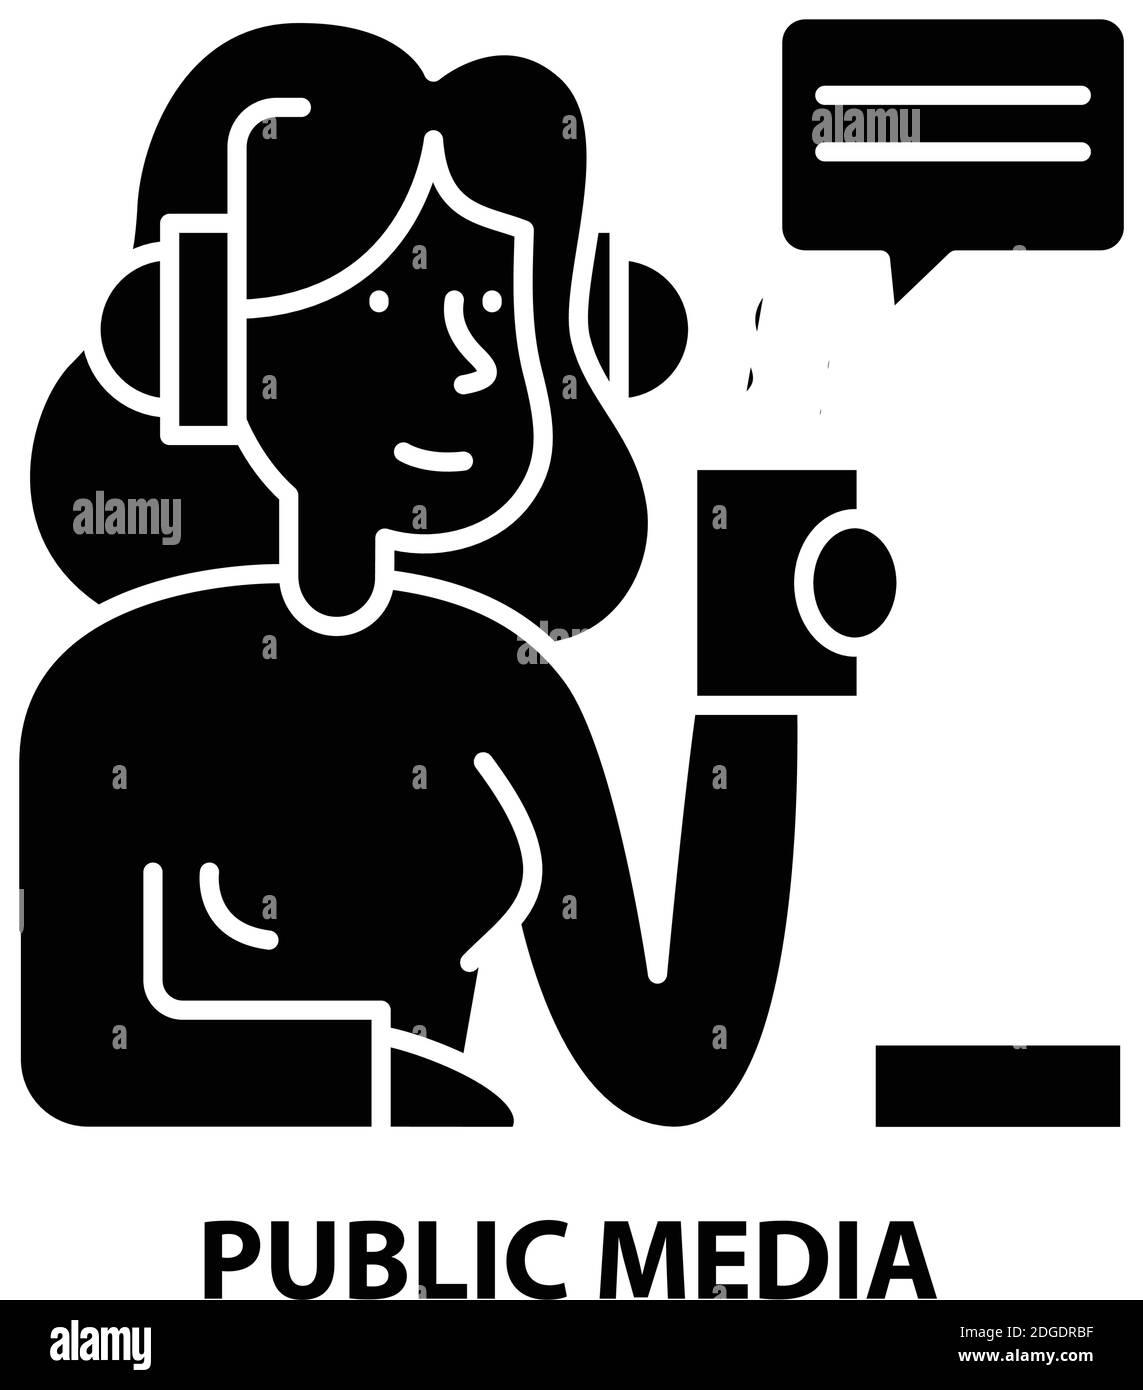 public media icon, black vector sign with editable strokes, concept illustration Stock Vector